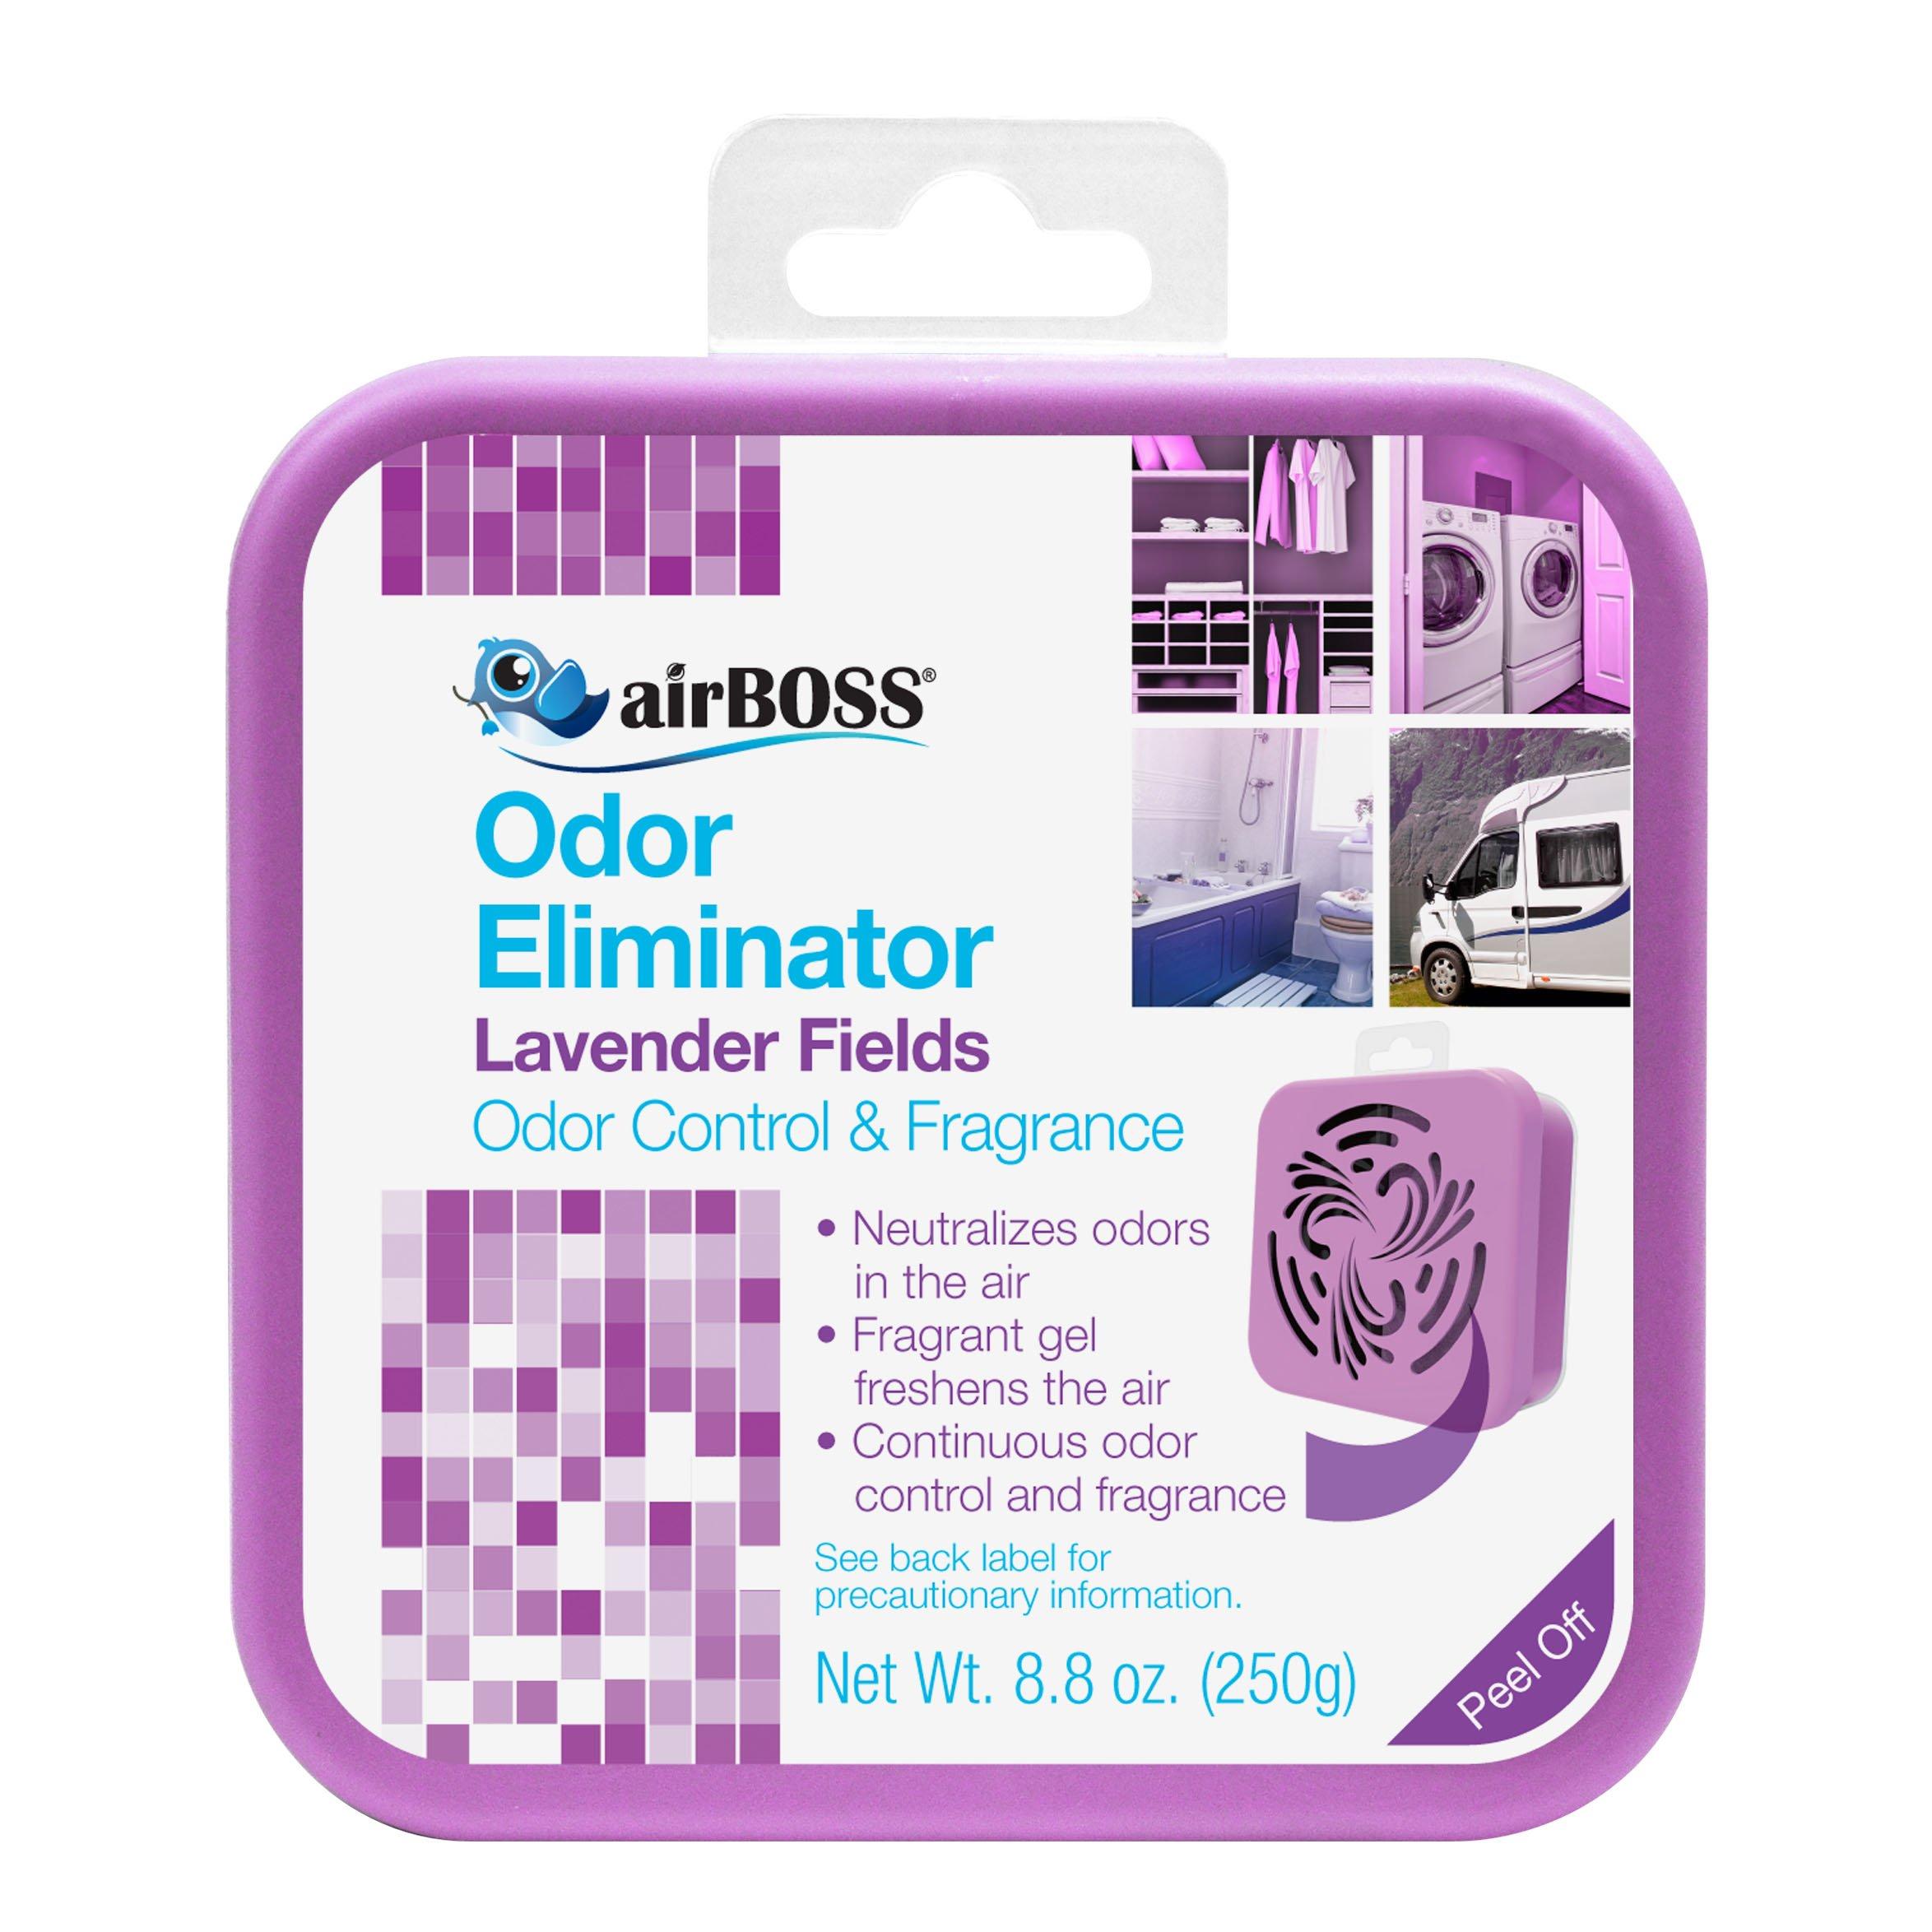 AirBOSS Closet Odor Eliminator   Lavender Fields